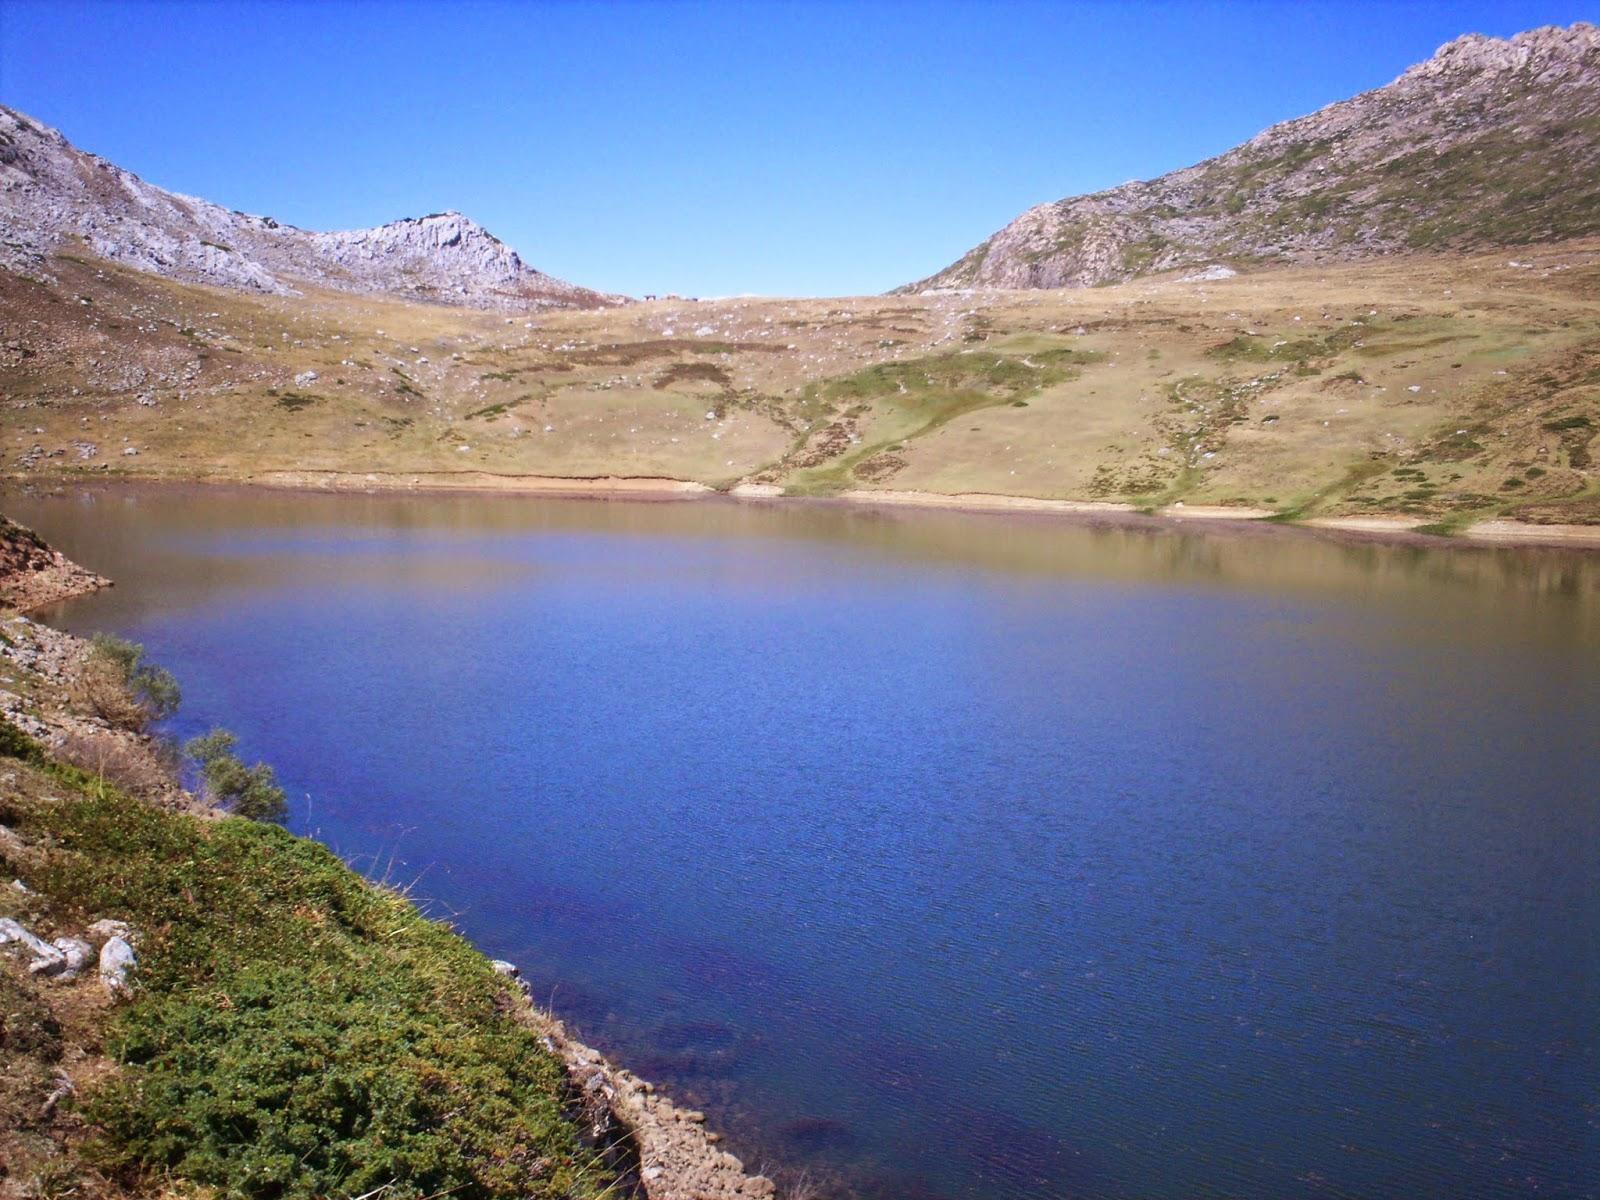 Agua azul en el lago Cerveriz en Somiedo.